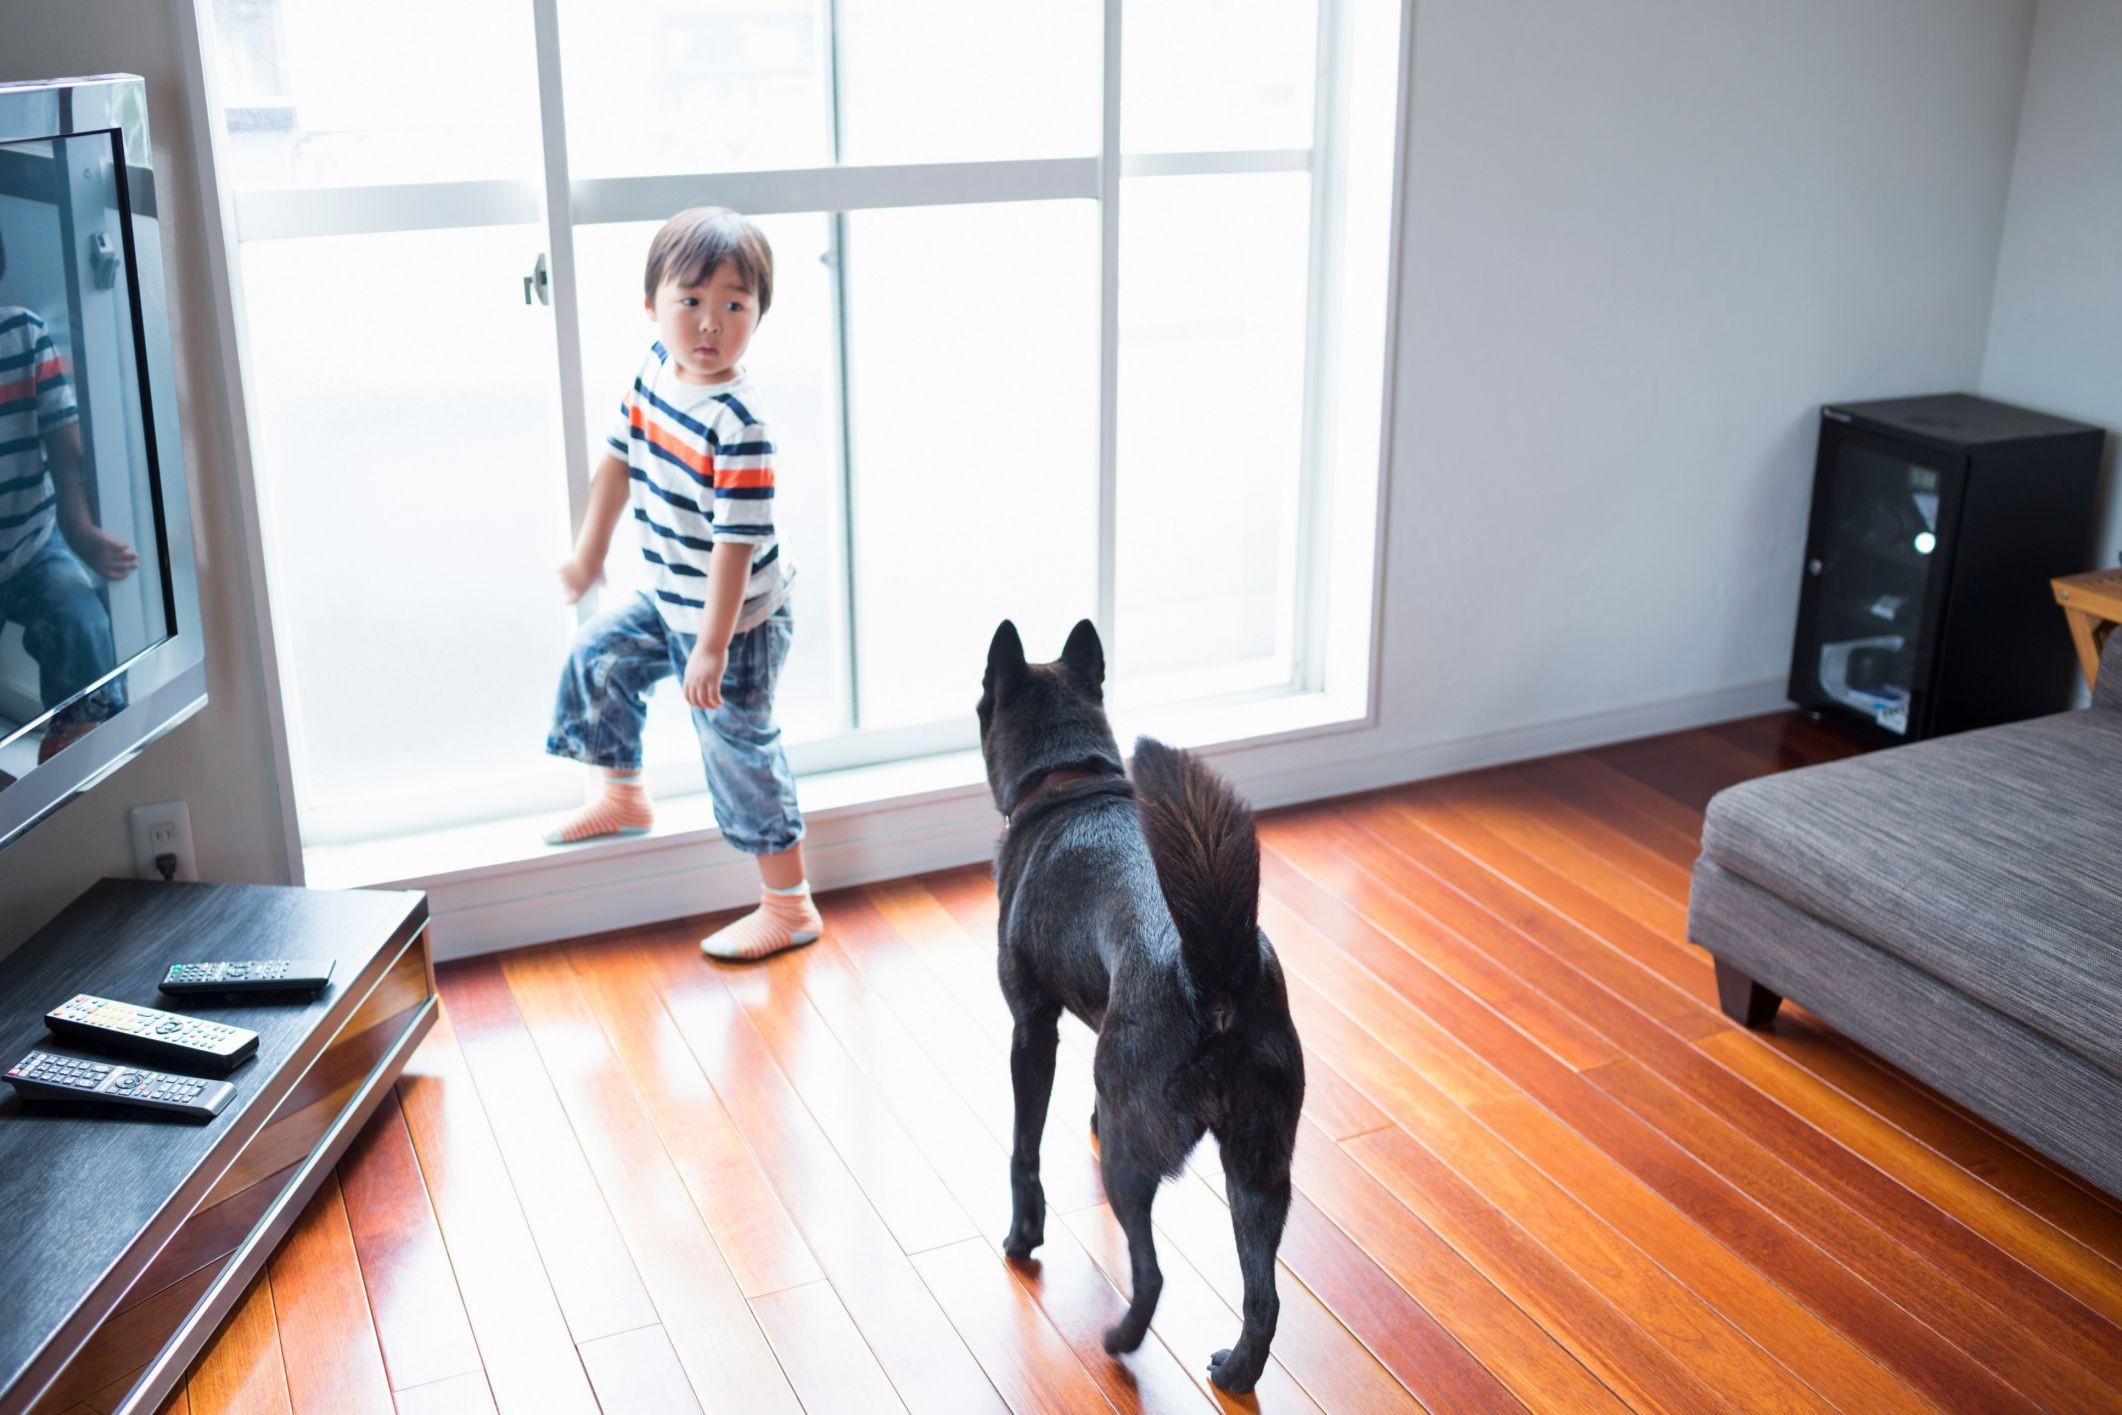 bamboo vs hardwood flooring durability of the most durable flooring you can install regarding dog on wooden floor 465892145 56a4a1705f9b58b7d0d7e64e